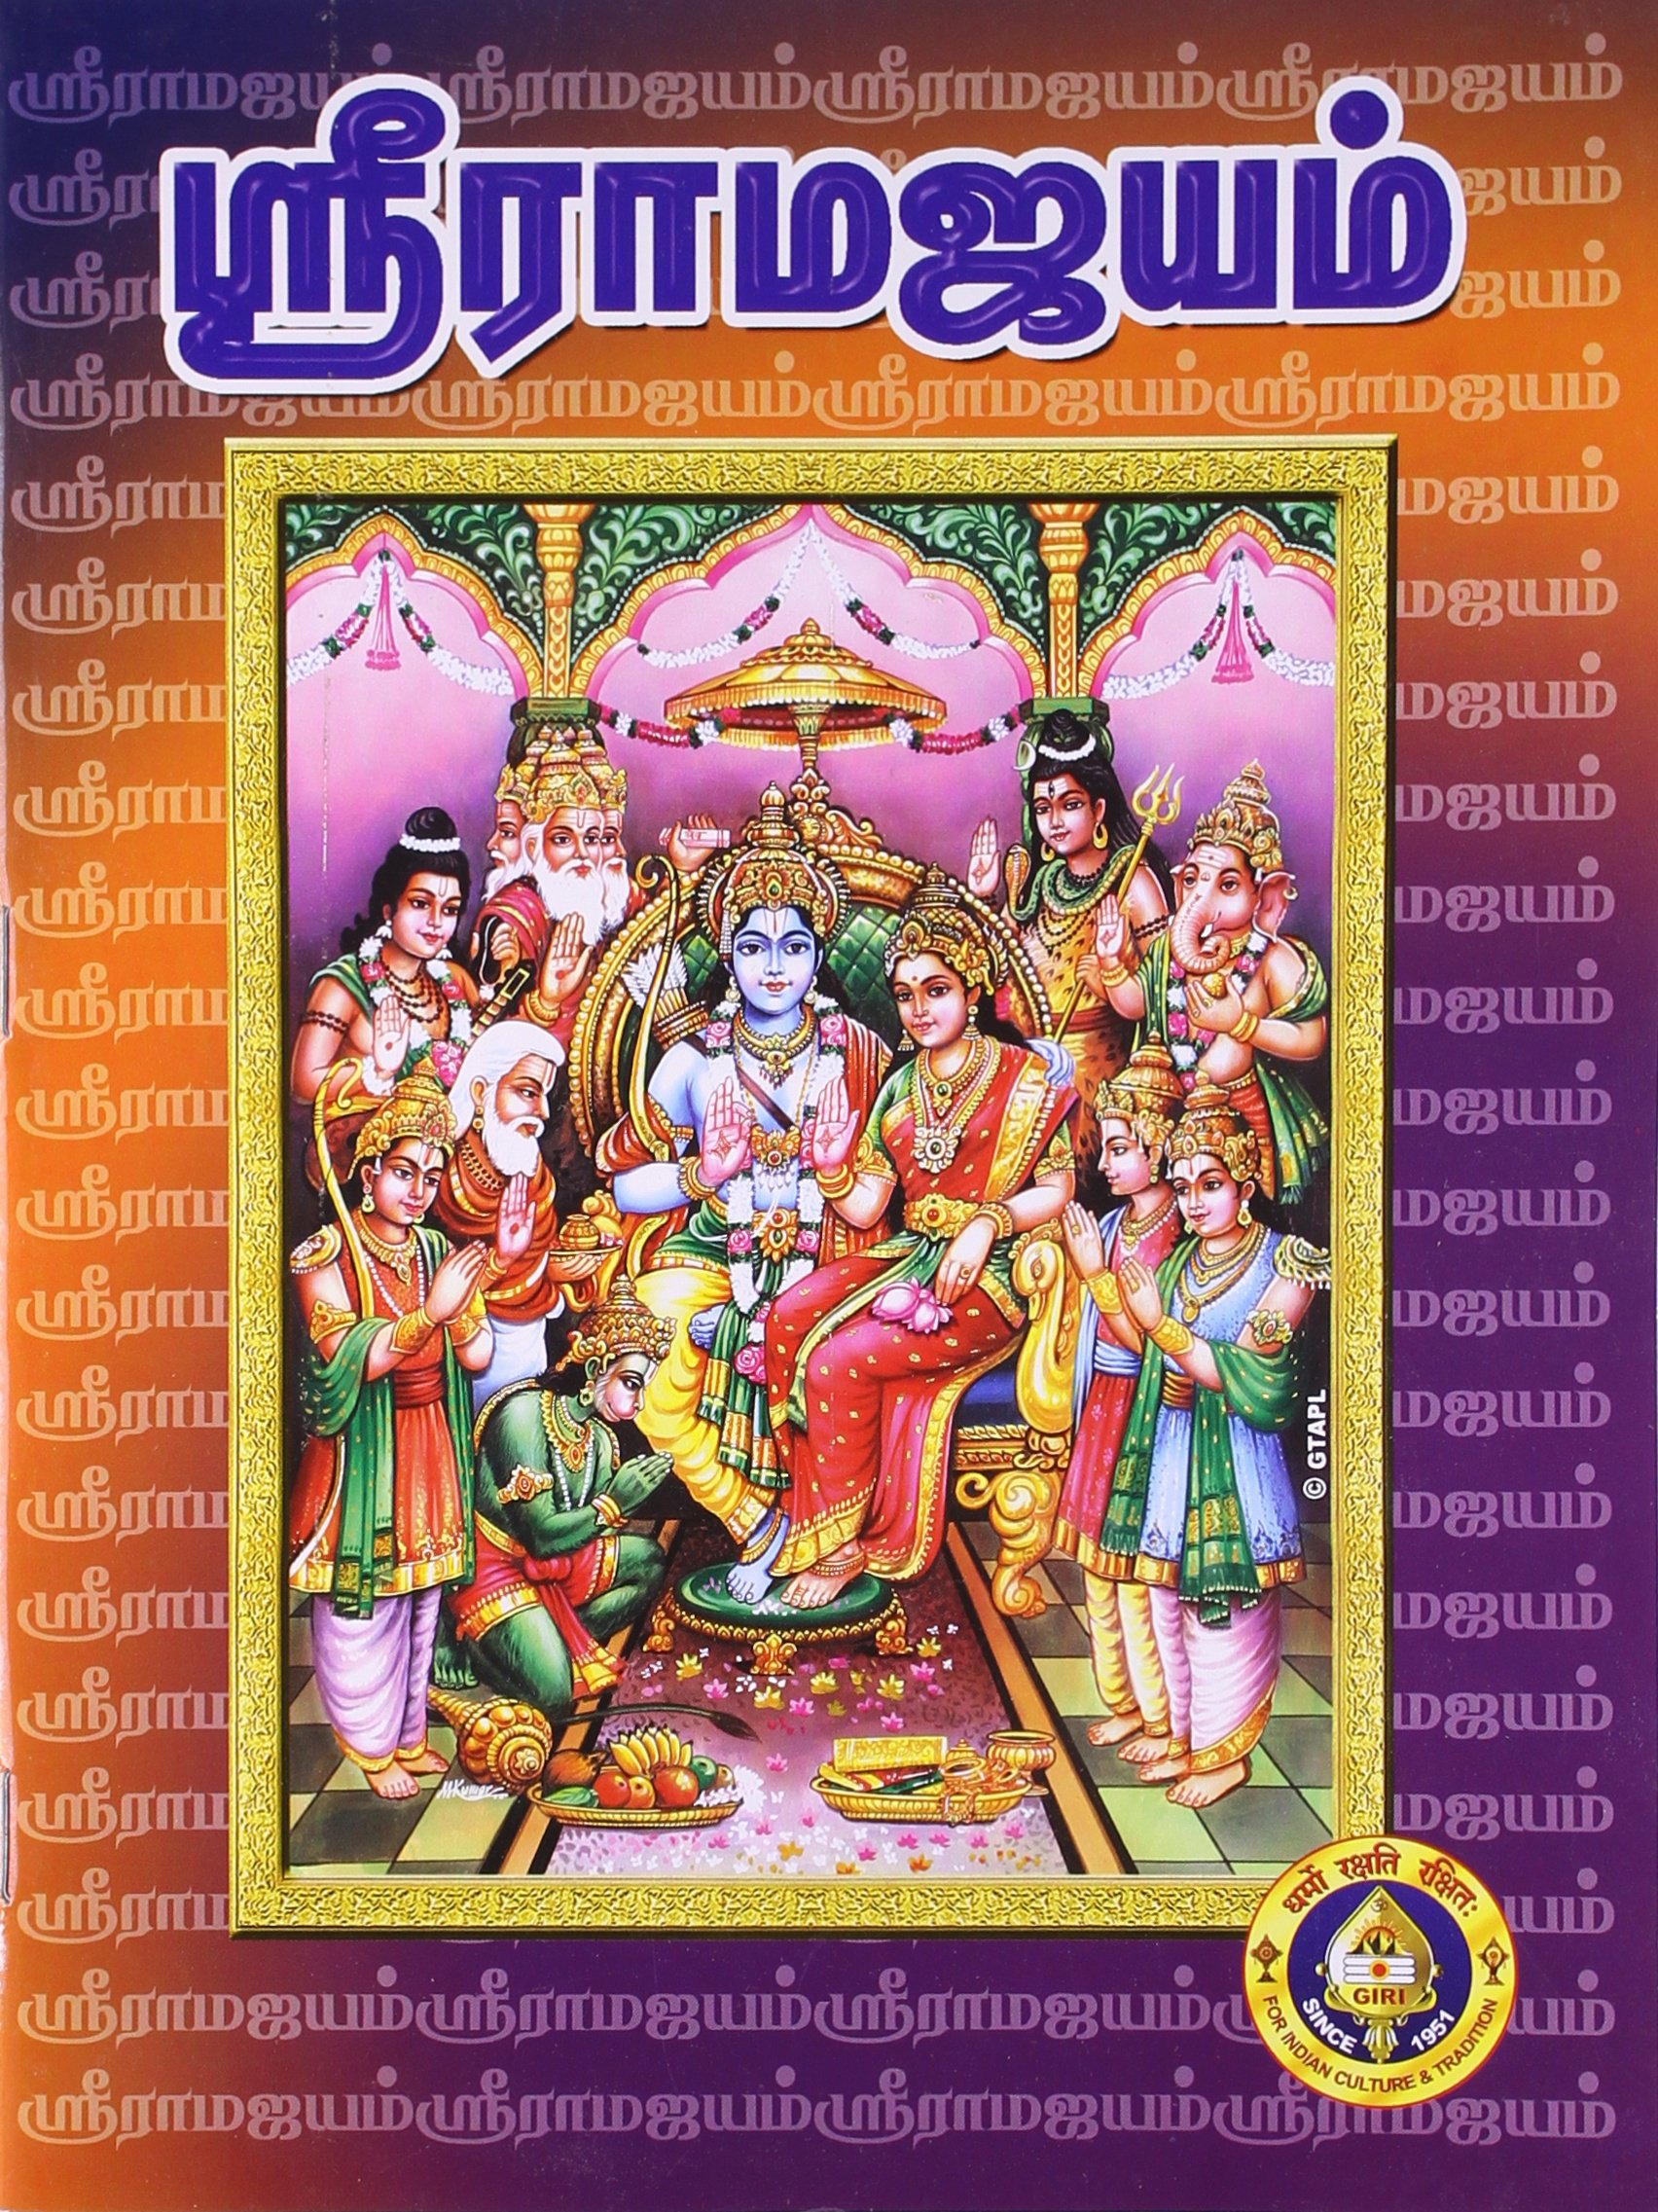 Sri rama jayam video song youtube.